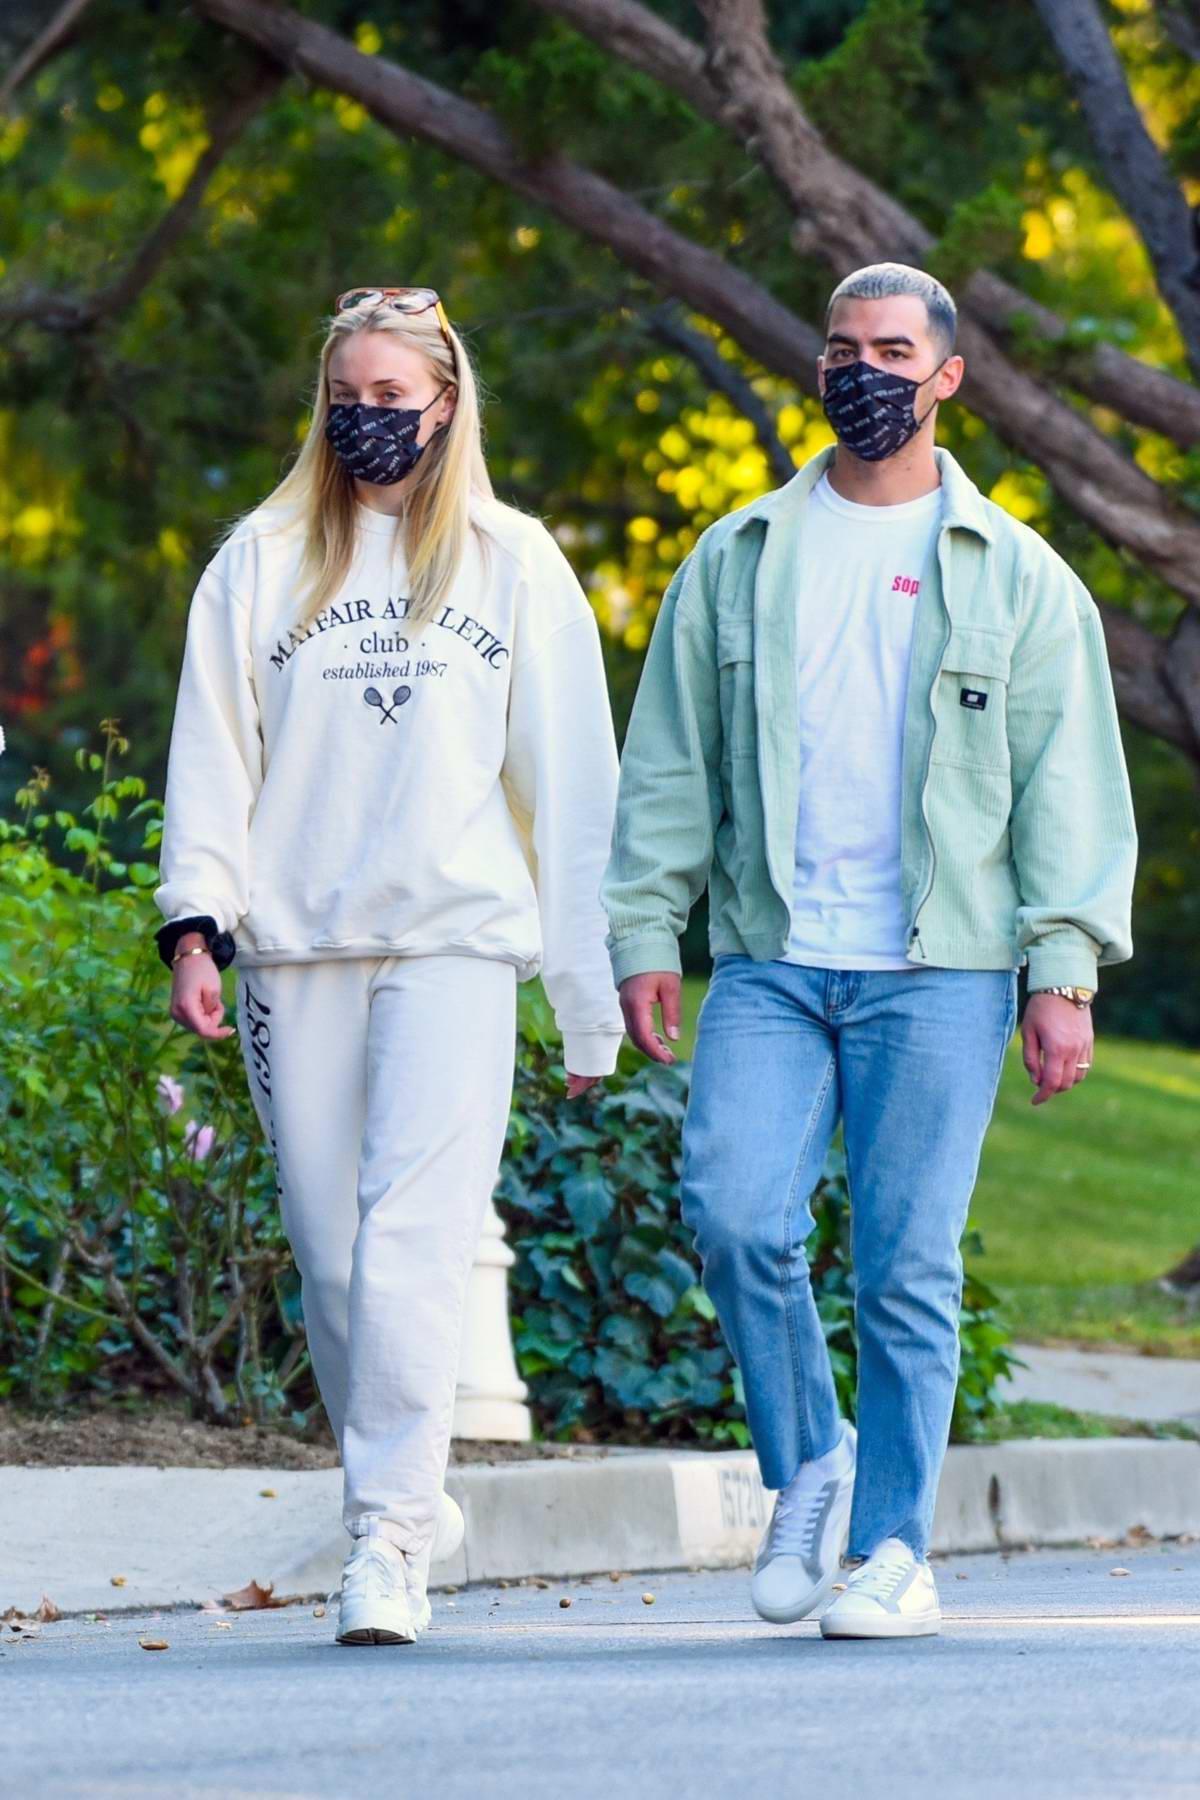 Sophie Turner and Joe Jonas enjoy their evening walk with their baby around the neighborhood in Los Angeles